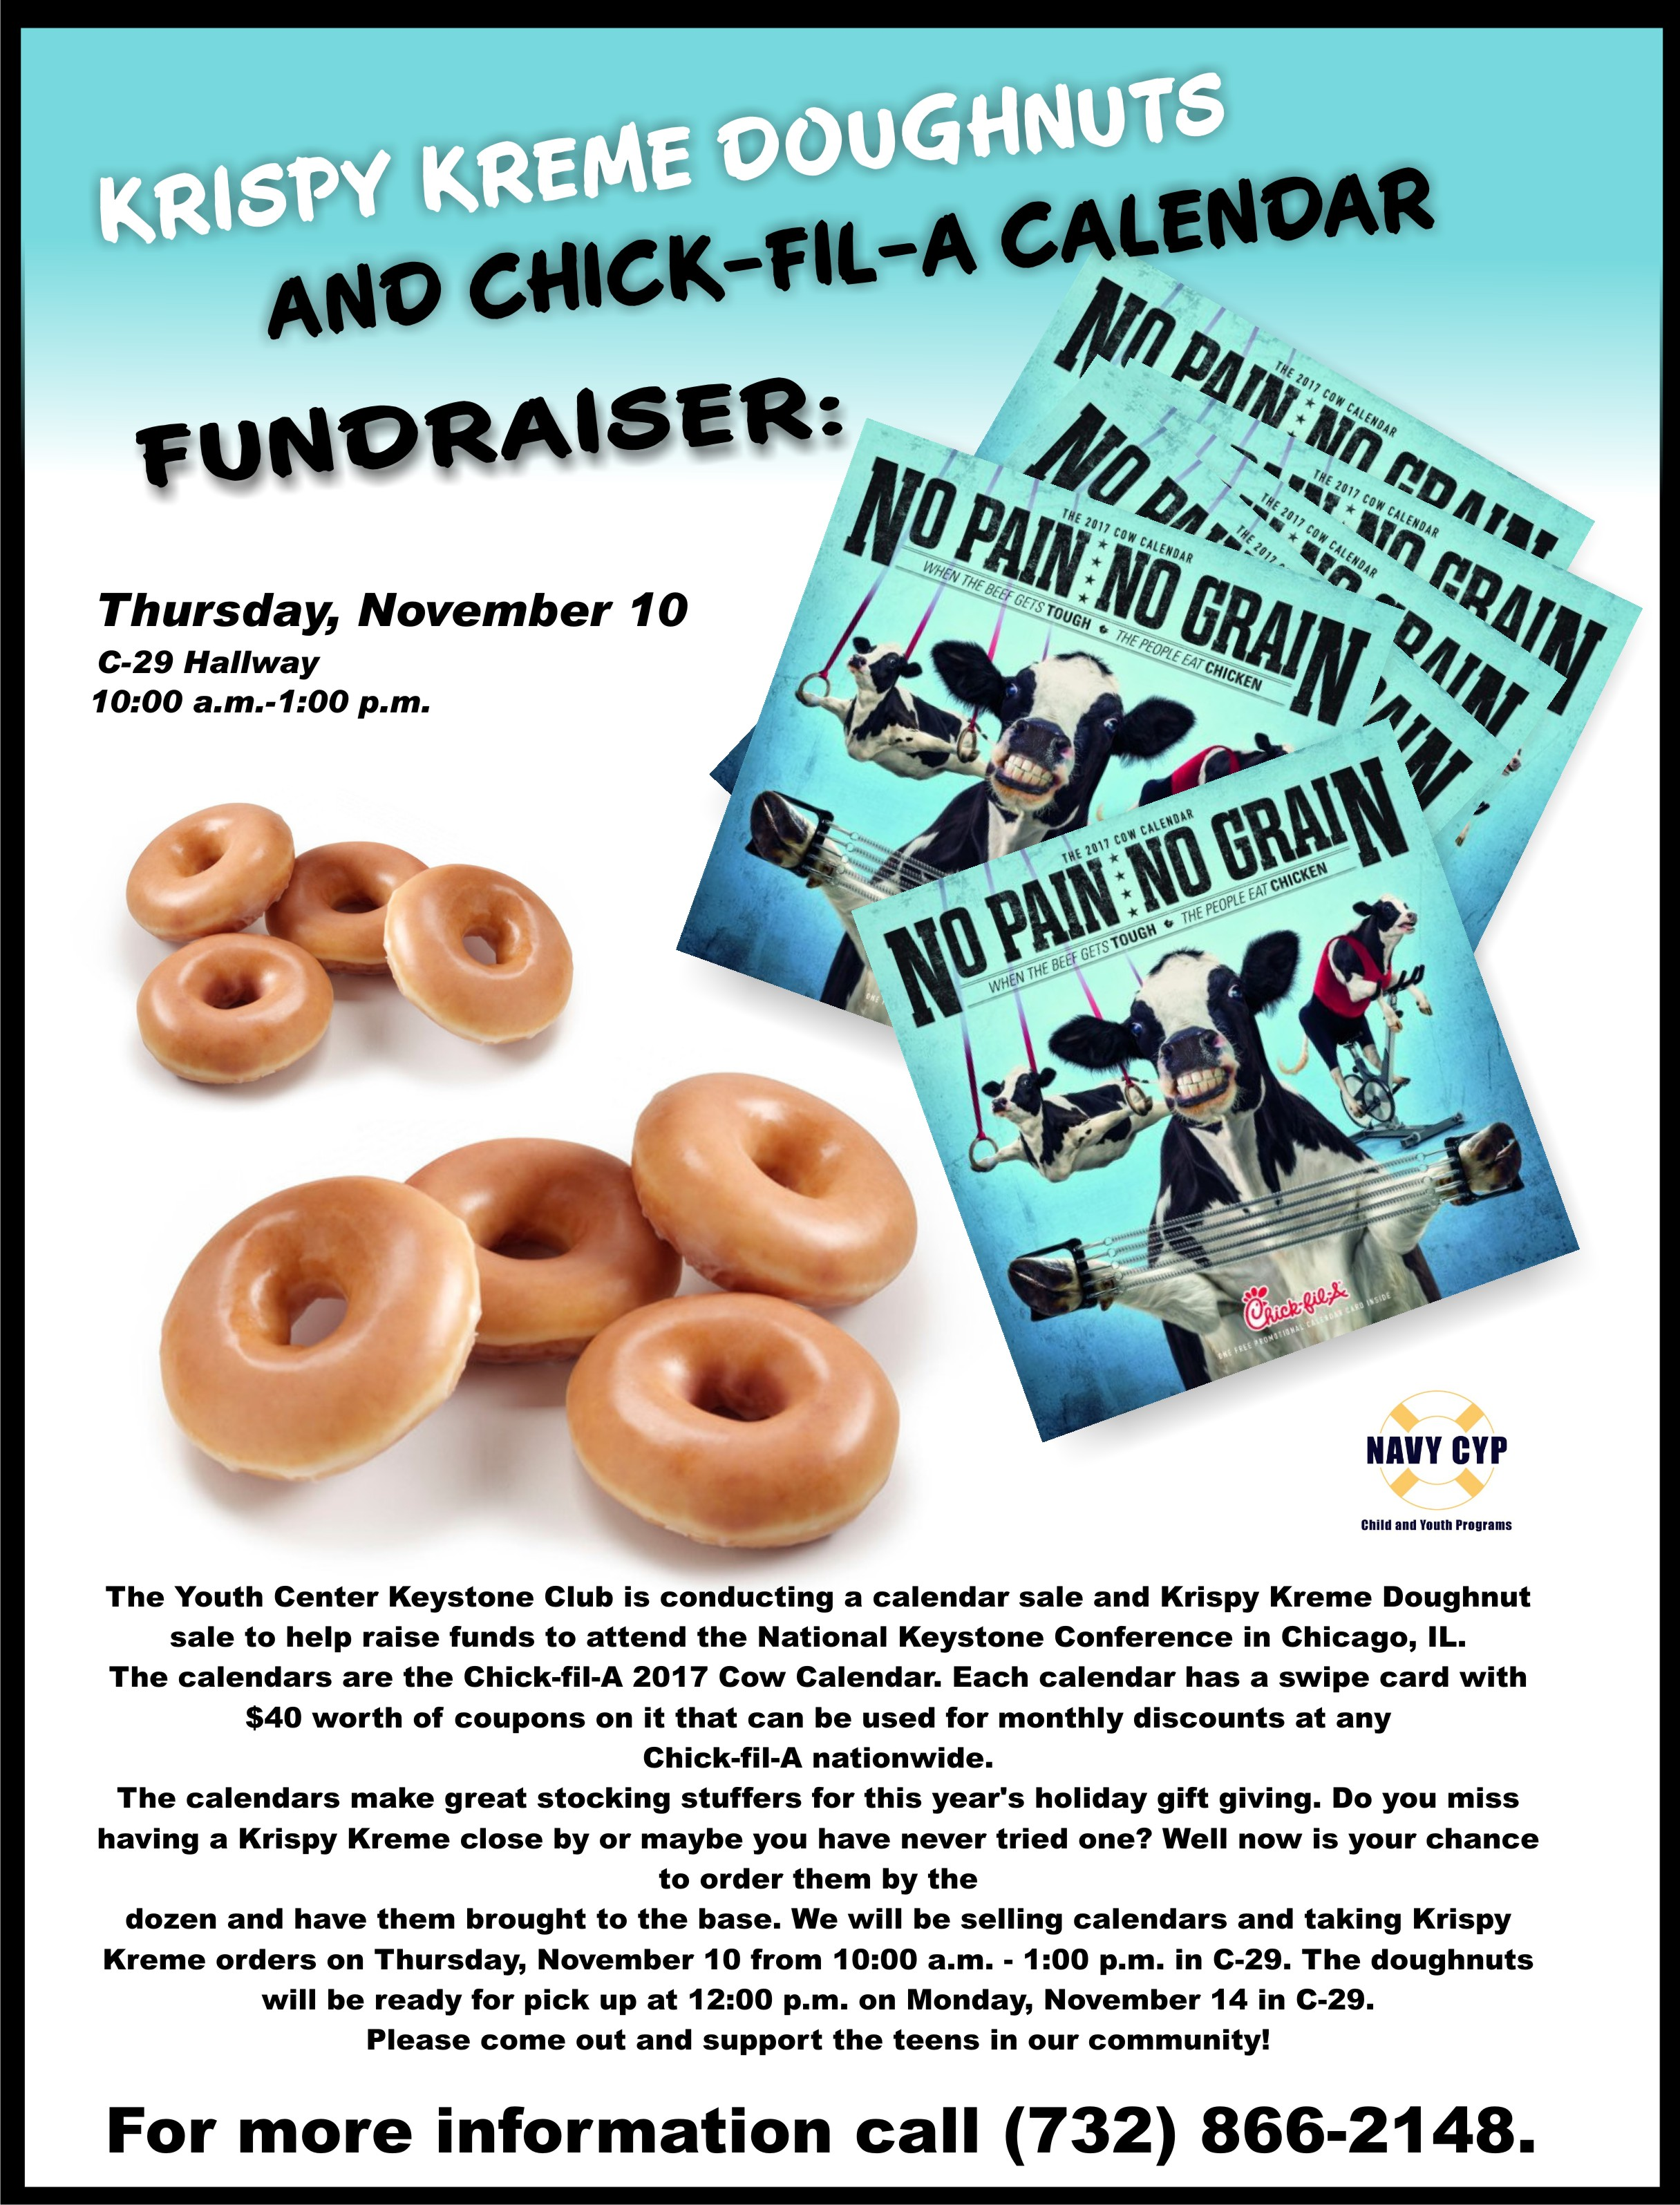 Krispy Kreme Calendar.Krispy Kreme Doughnuts And Chick Fil A Calendar Fundraiser